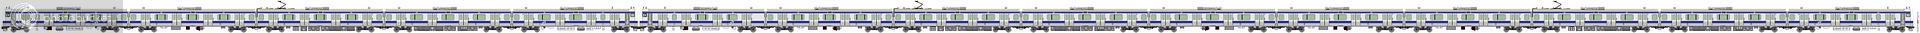 Train 2008